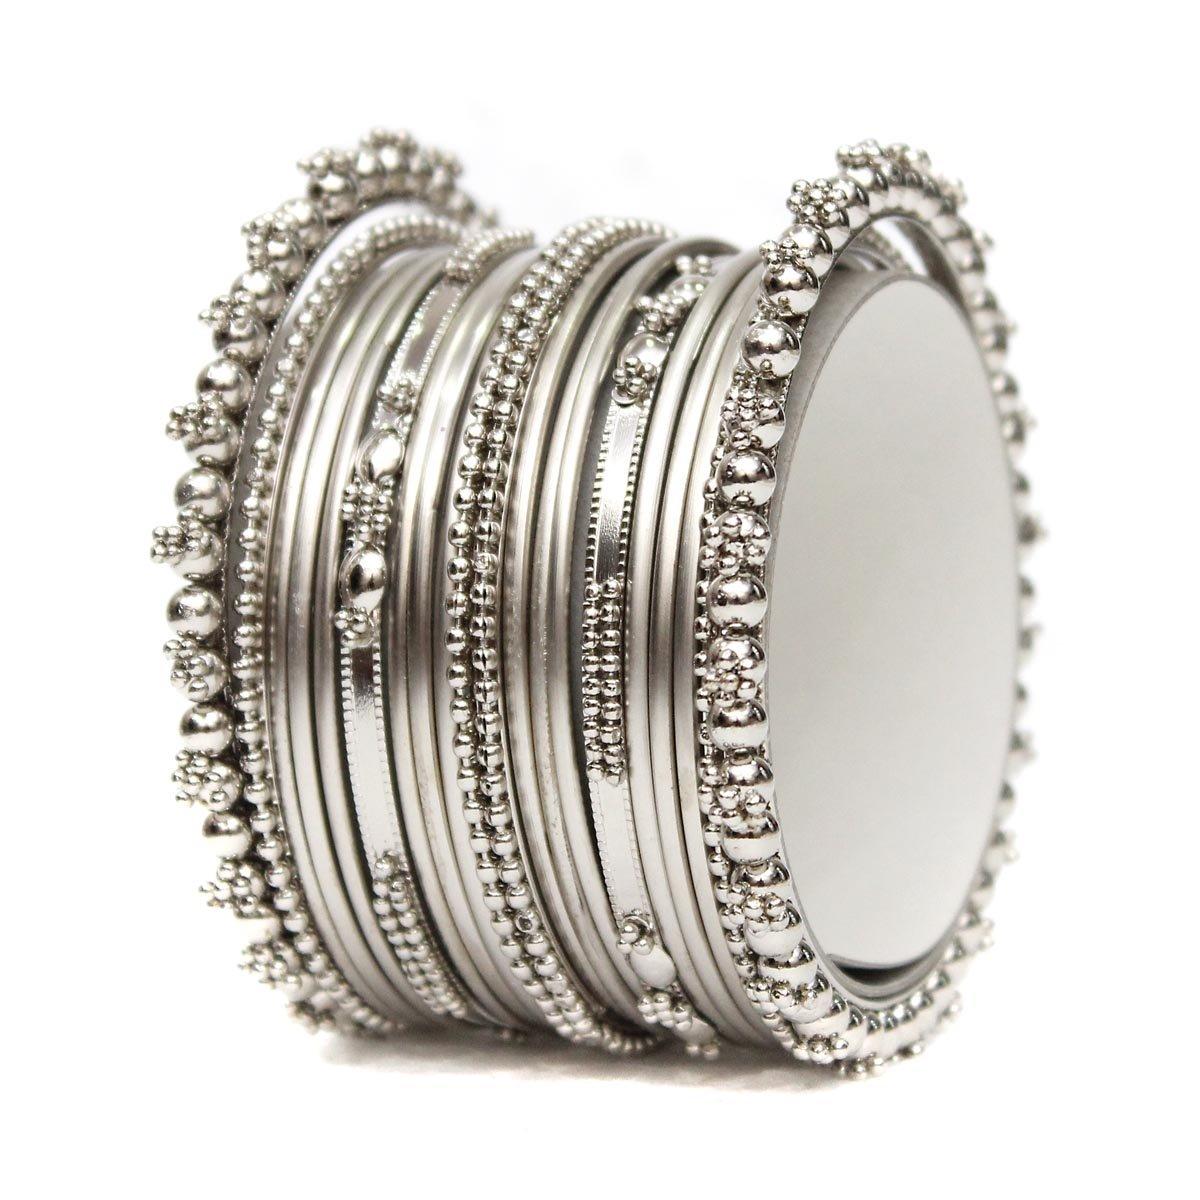 Joyeria Zircon Fashion Latest Bollywood Designer Silver Tone Bangles Set Bracelet Indian Partywear Jewelry (2.8)